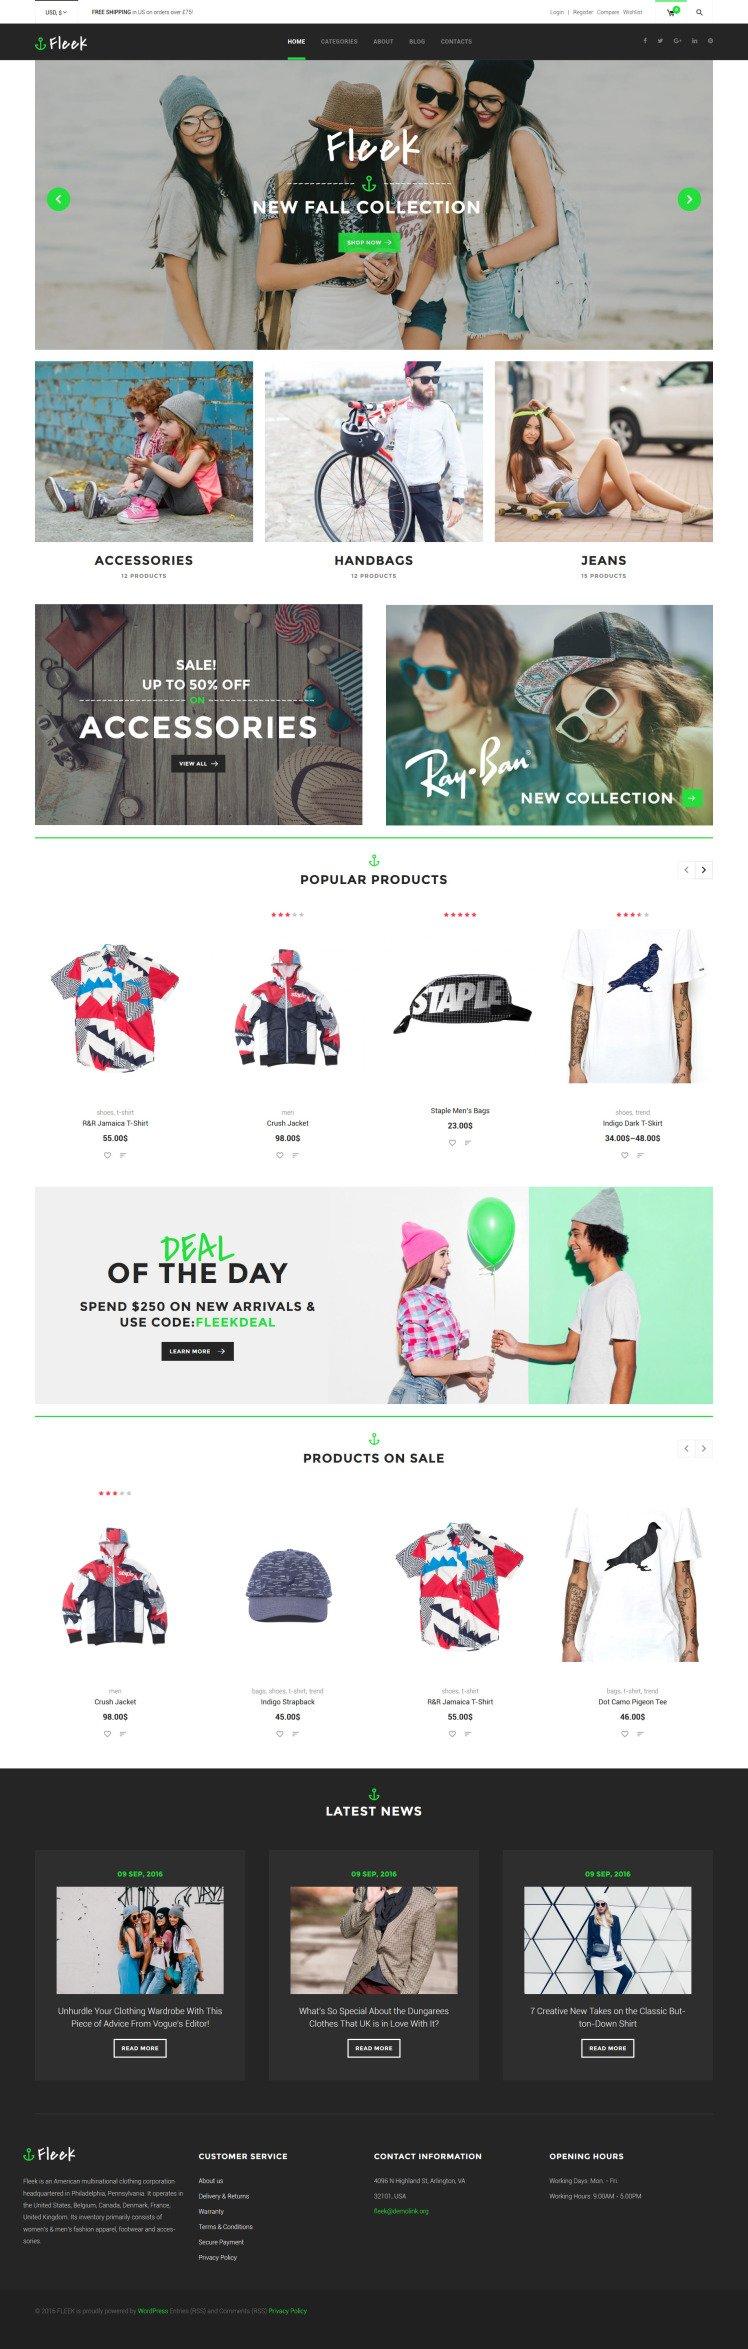 Fleek Urban Fashion Store WooCommerce Themes